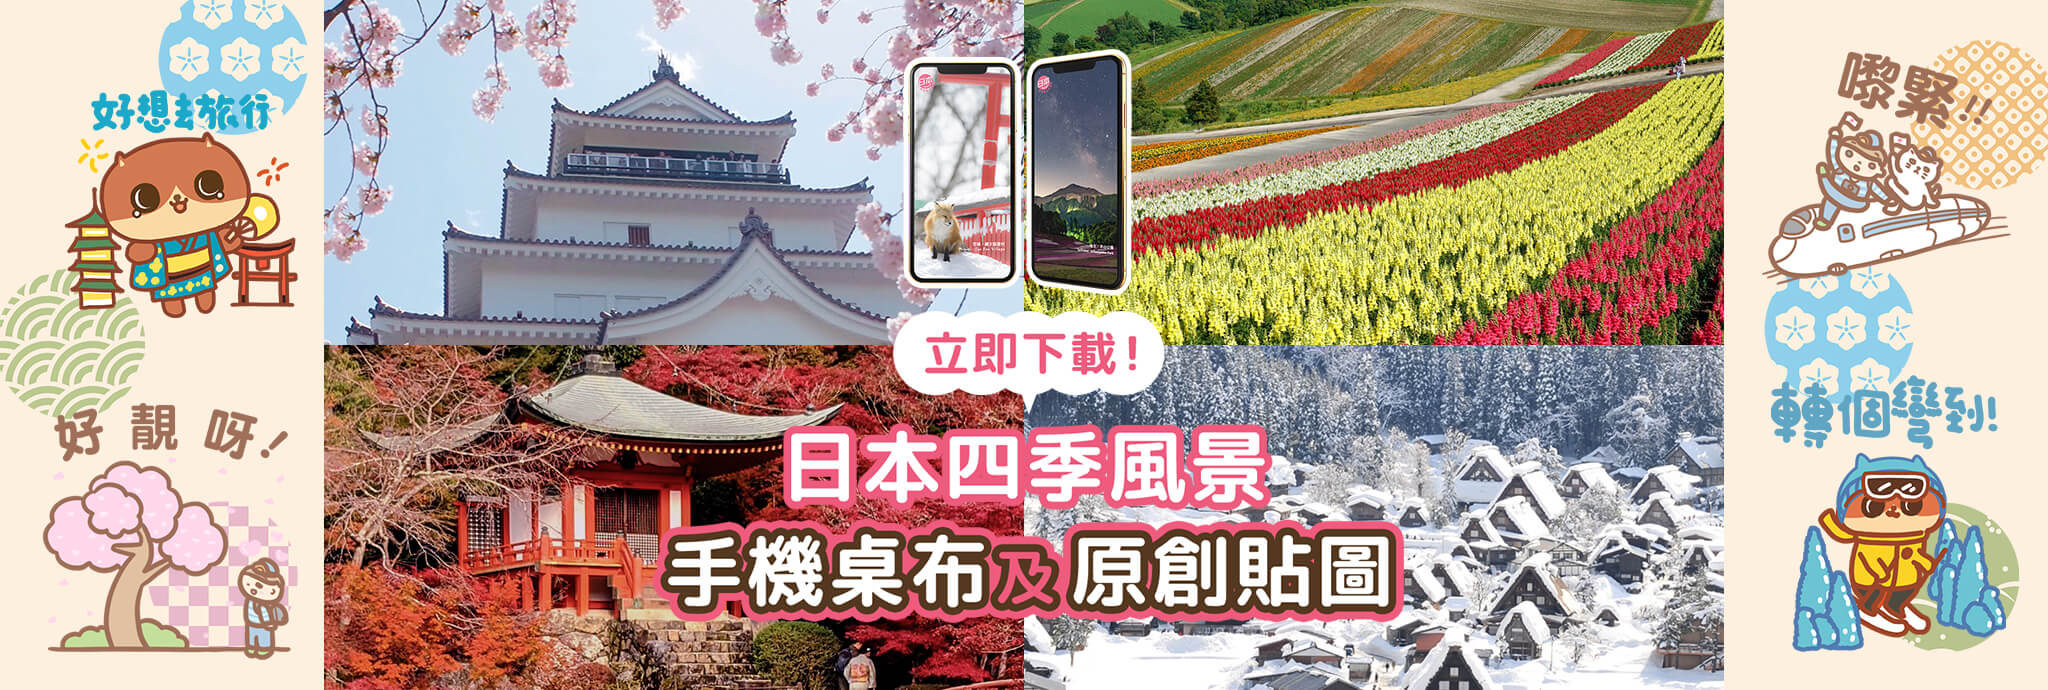 SmartPhone Wallpapers&Stickers Download